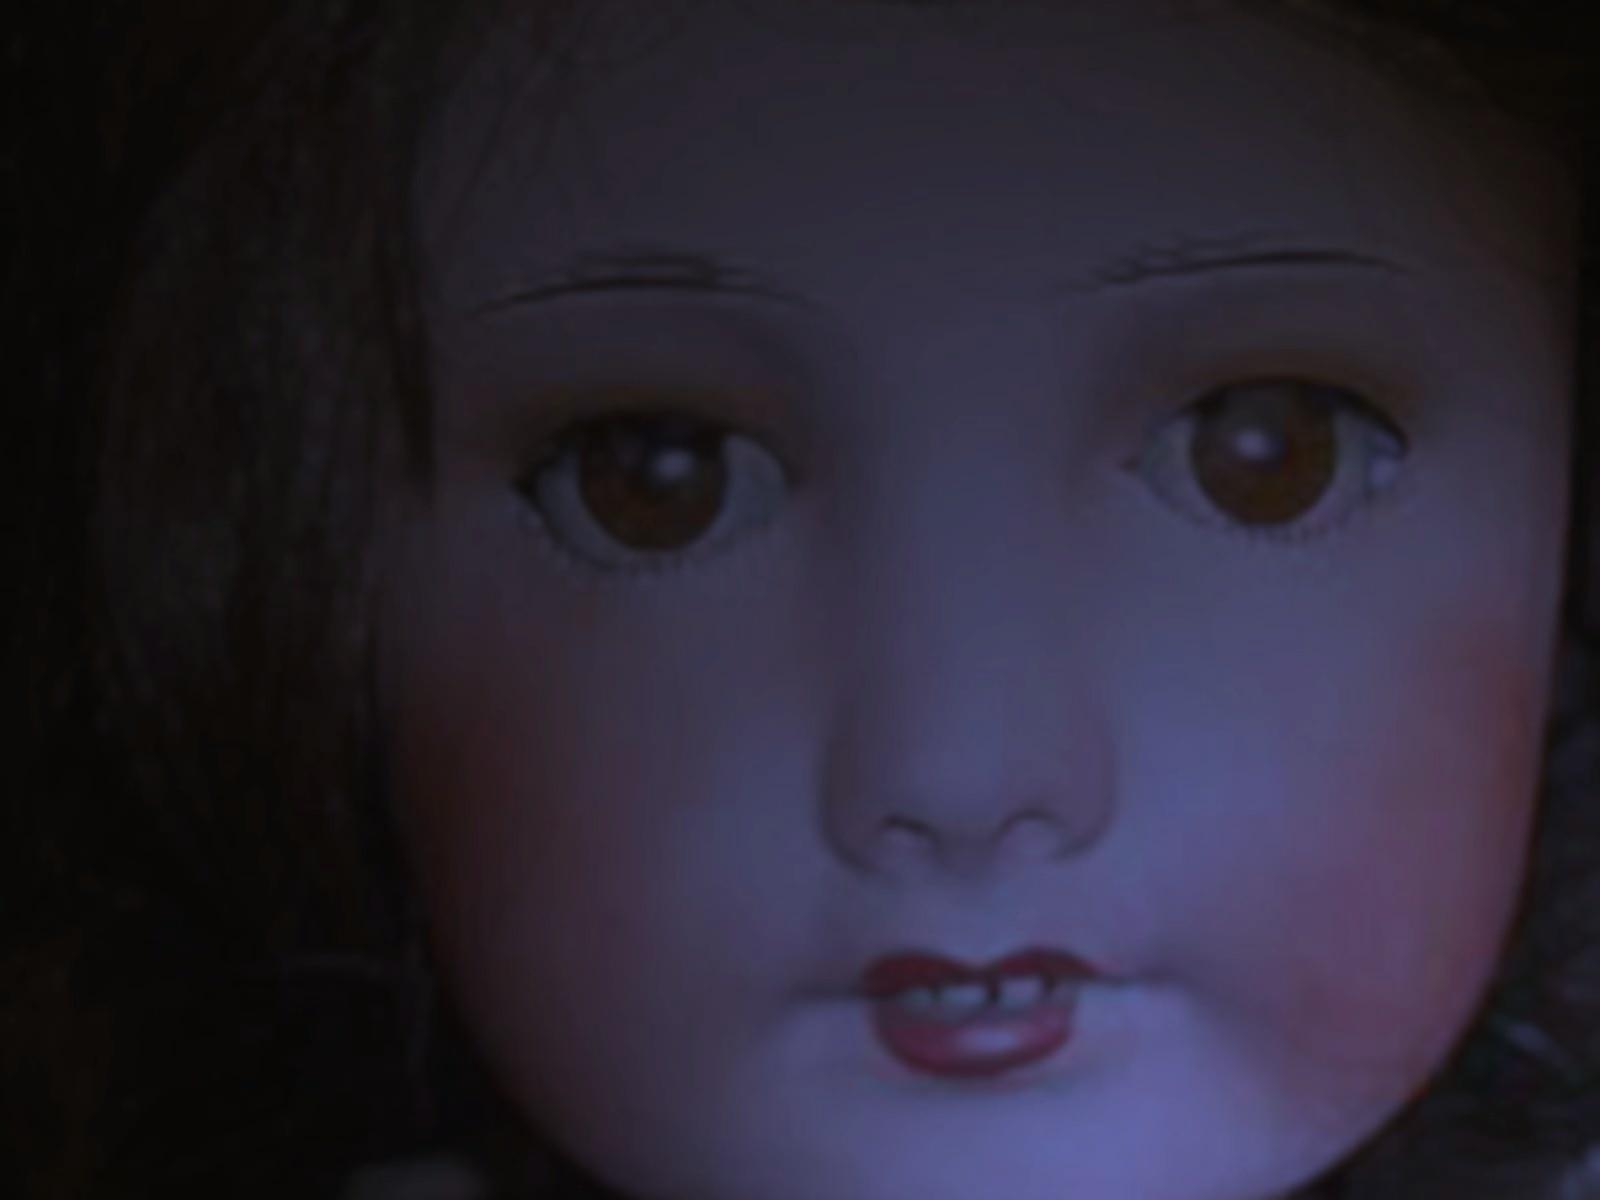 Amanda the Haunted doll